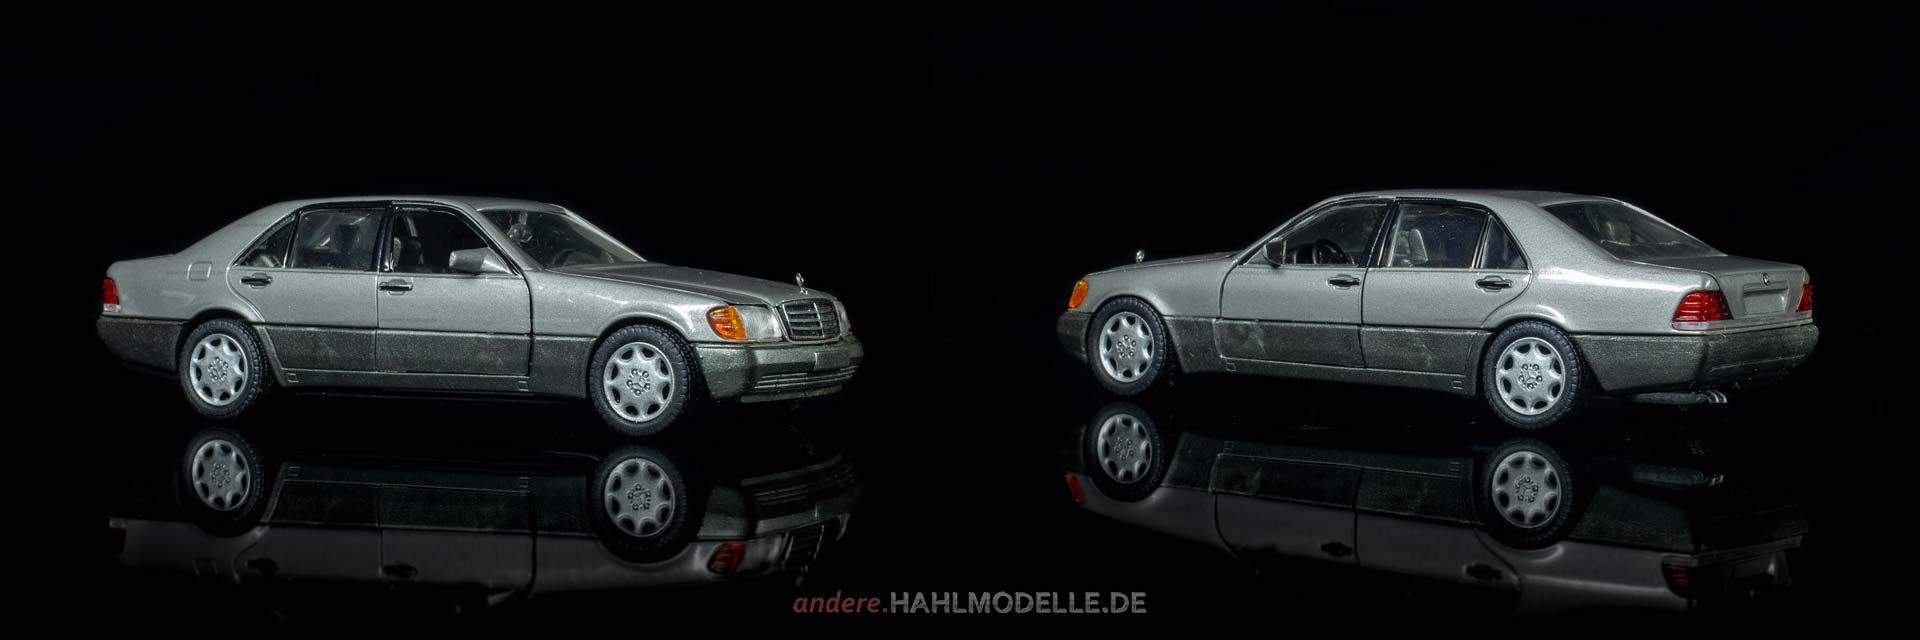 Mercedes-Benz 600 SEL (V 140 | Limousine | Schabak | www.andere.hahlmodelle.de